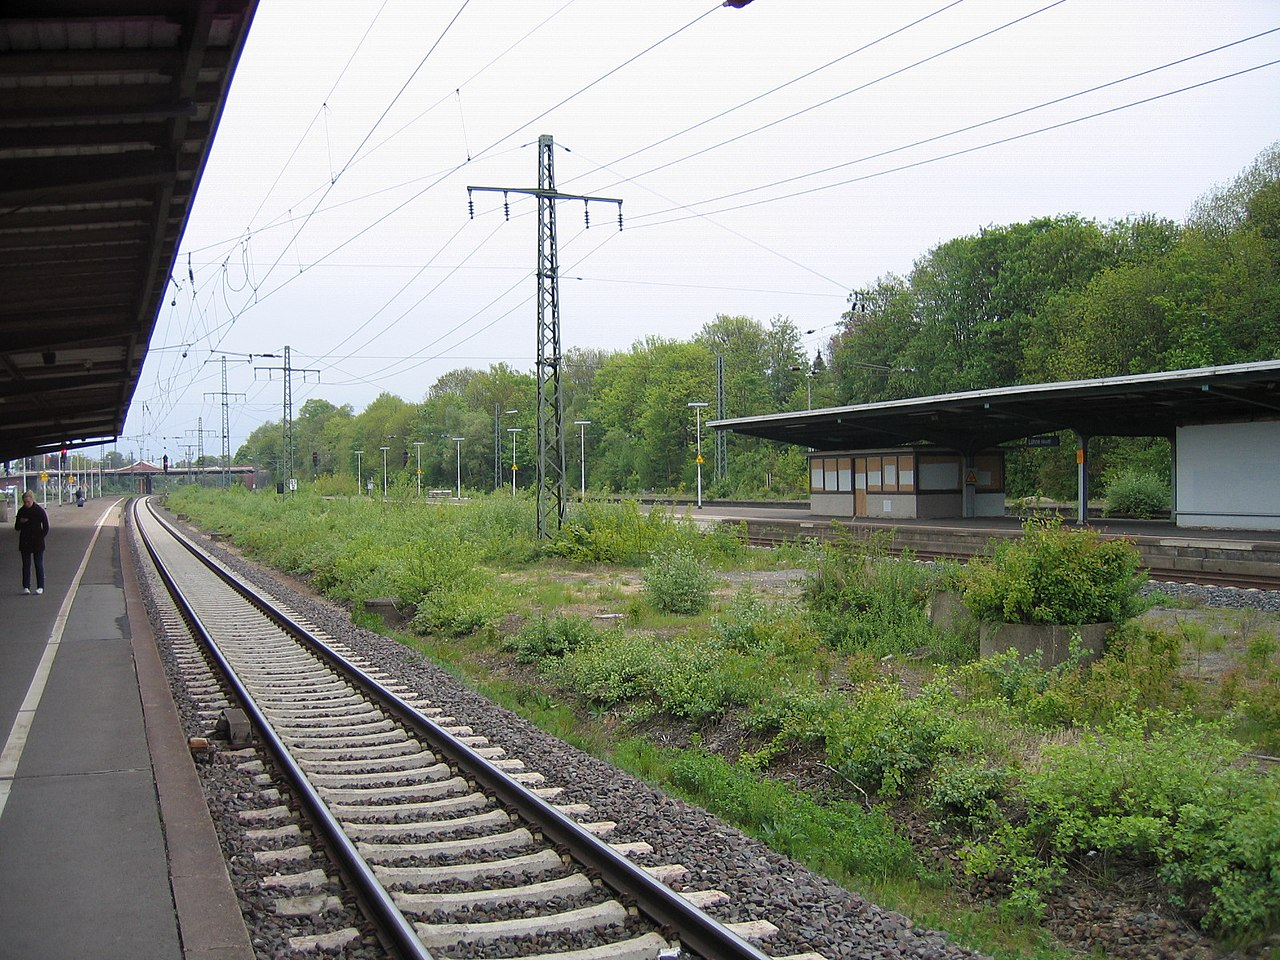 Bahnhof L Hne file 2010 05 11 löhne hbf 3 jpg wikimedia commons